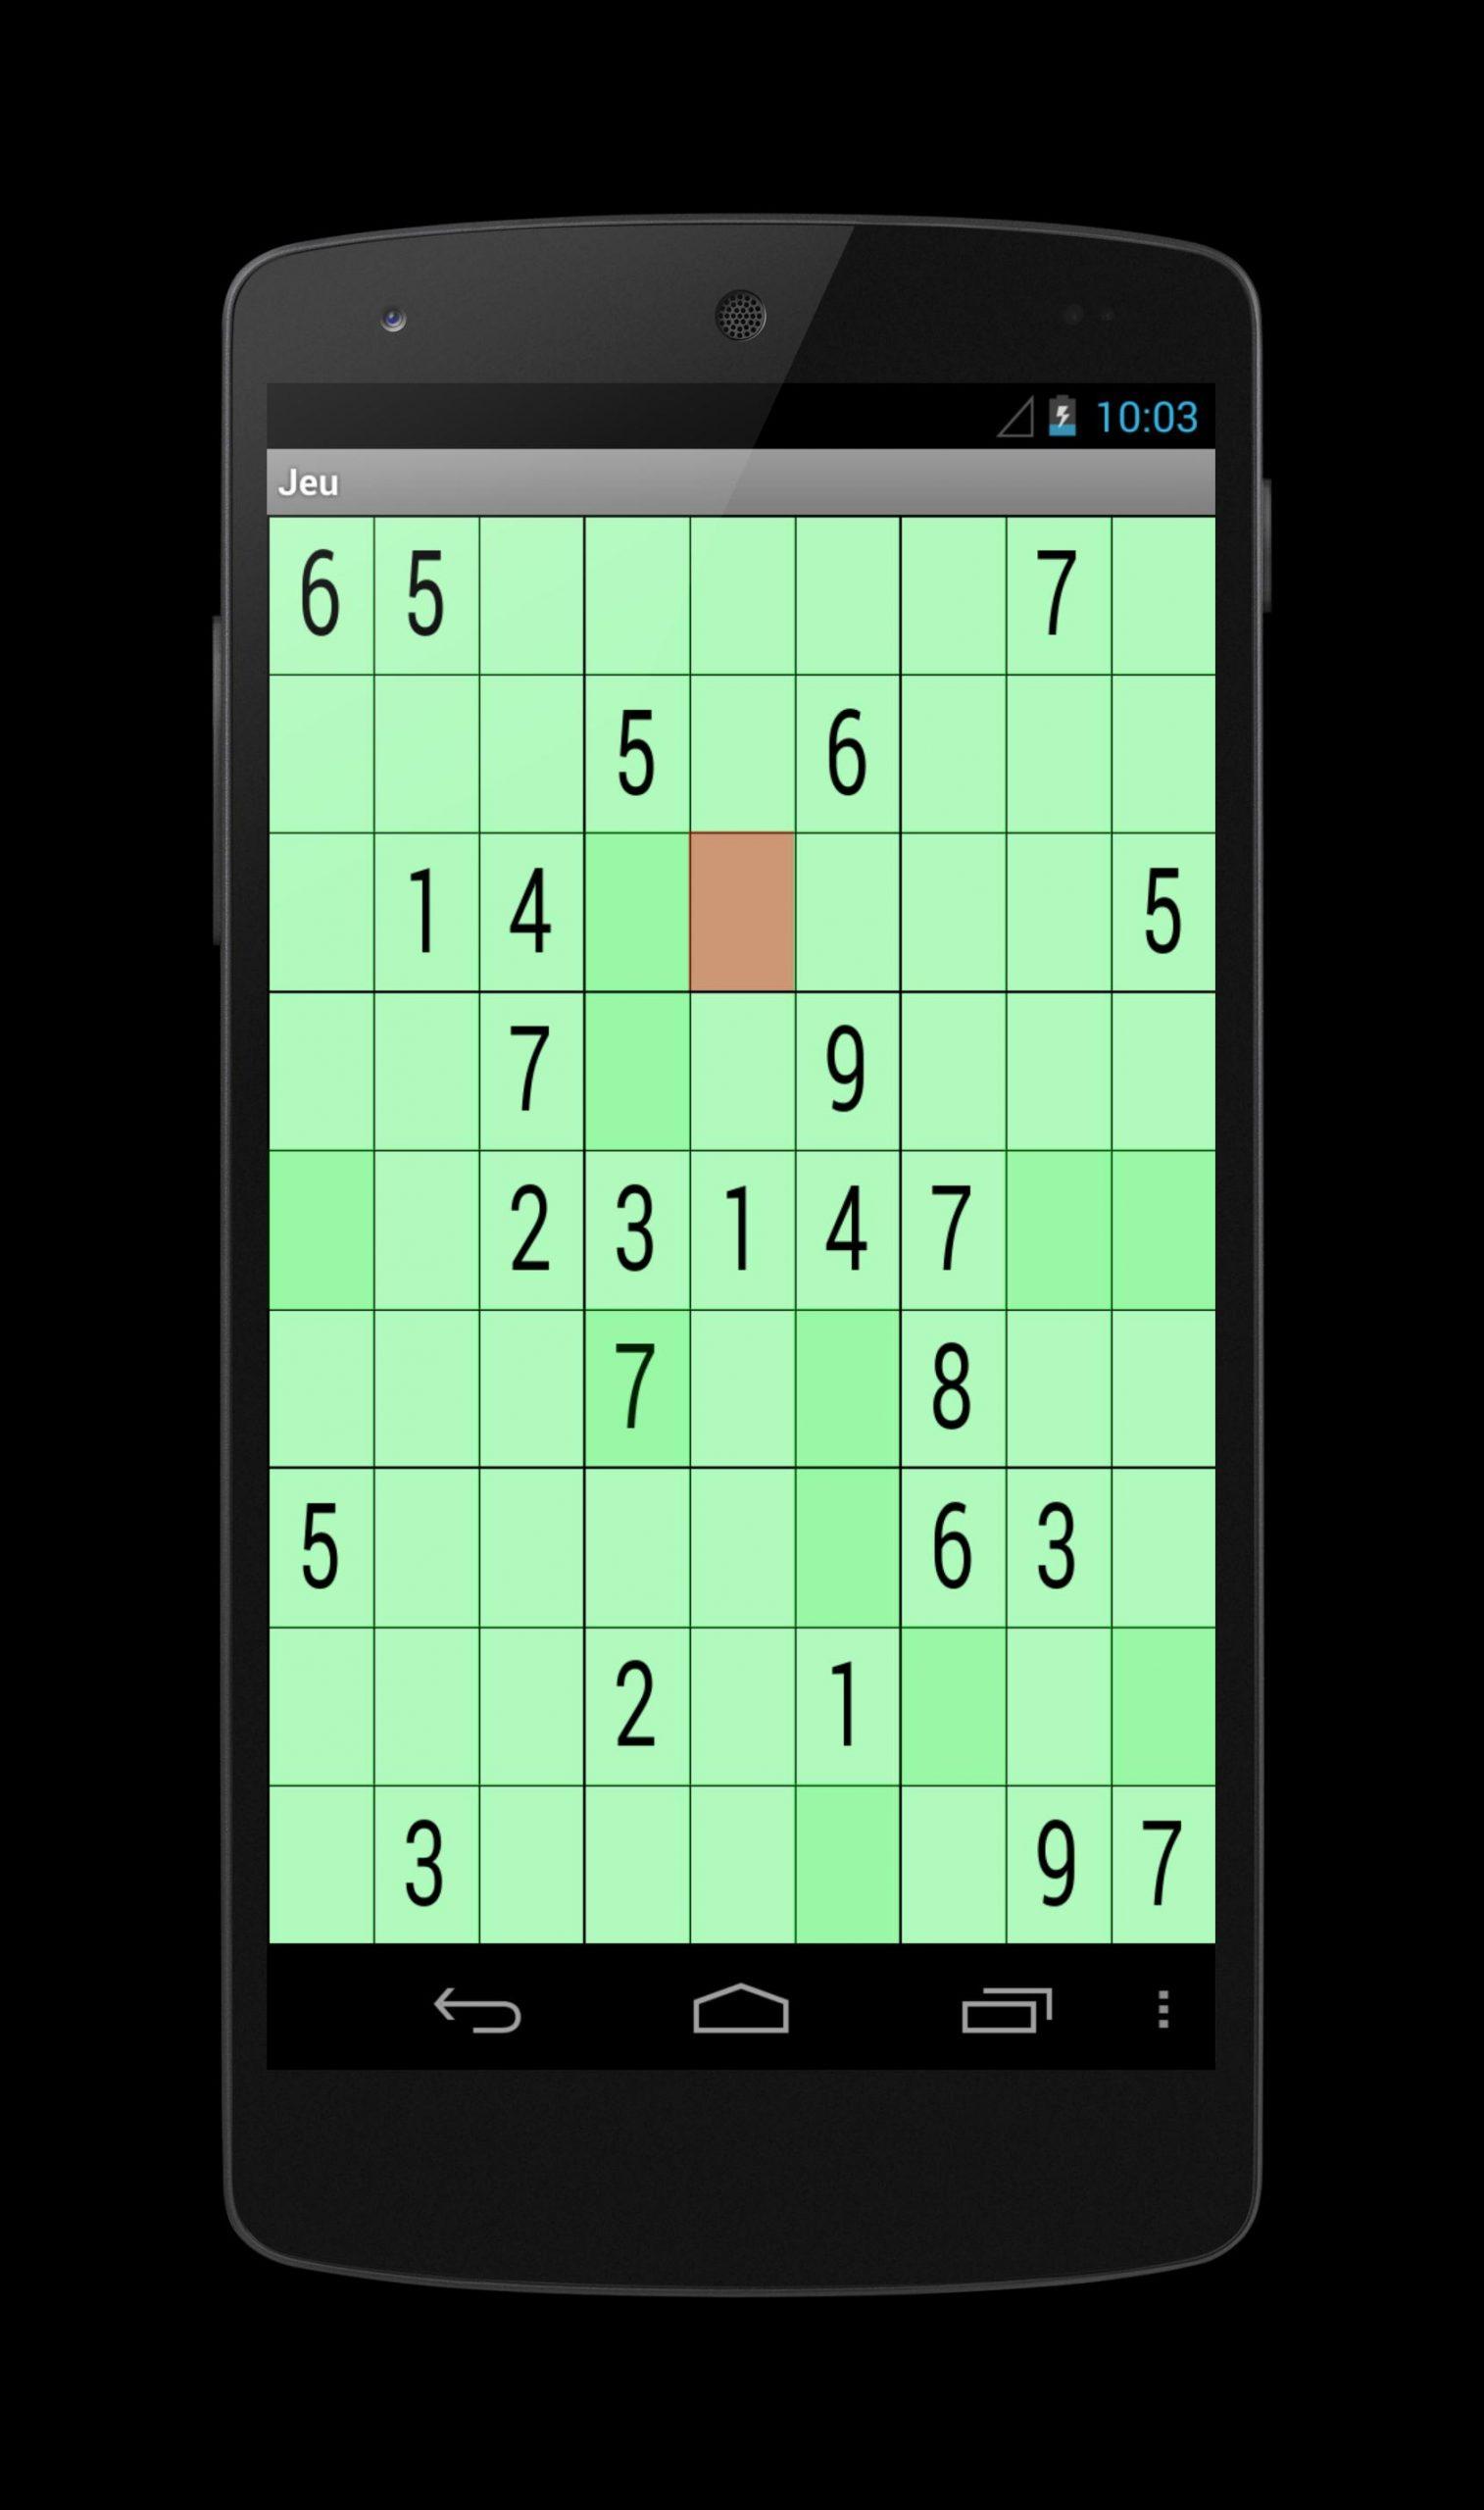 Android Için Sudoku 9X9 - Apk'yı İndir concernant Comment Jouer Sudoku